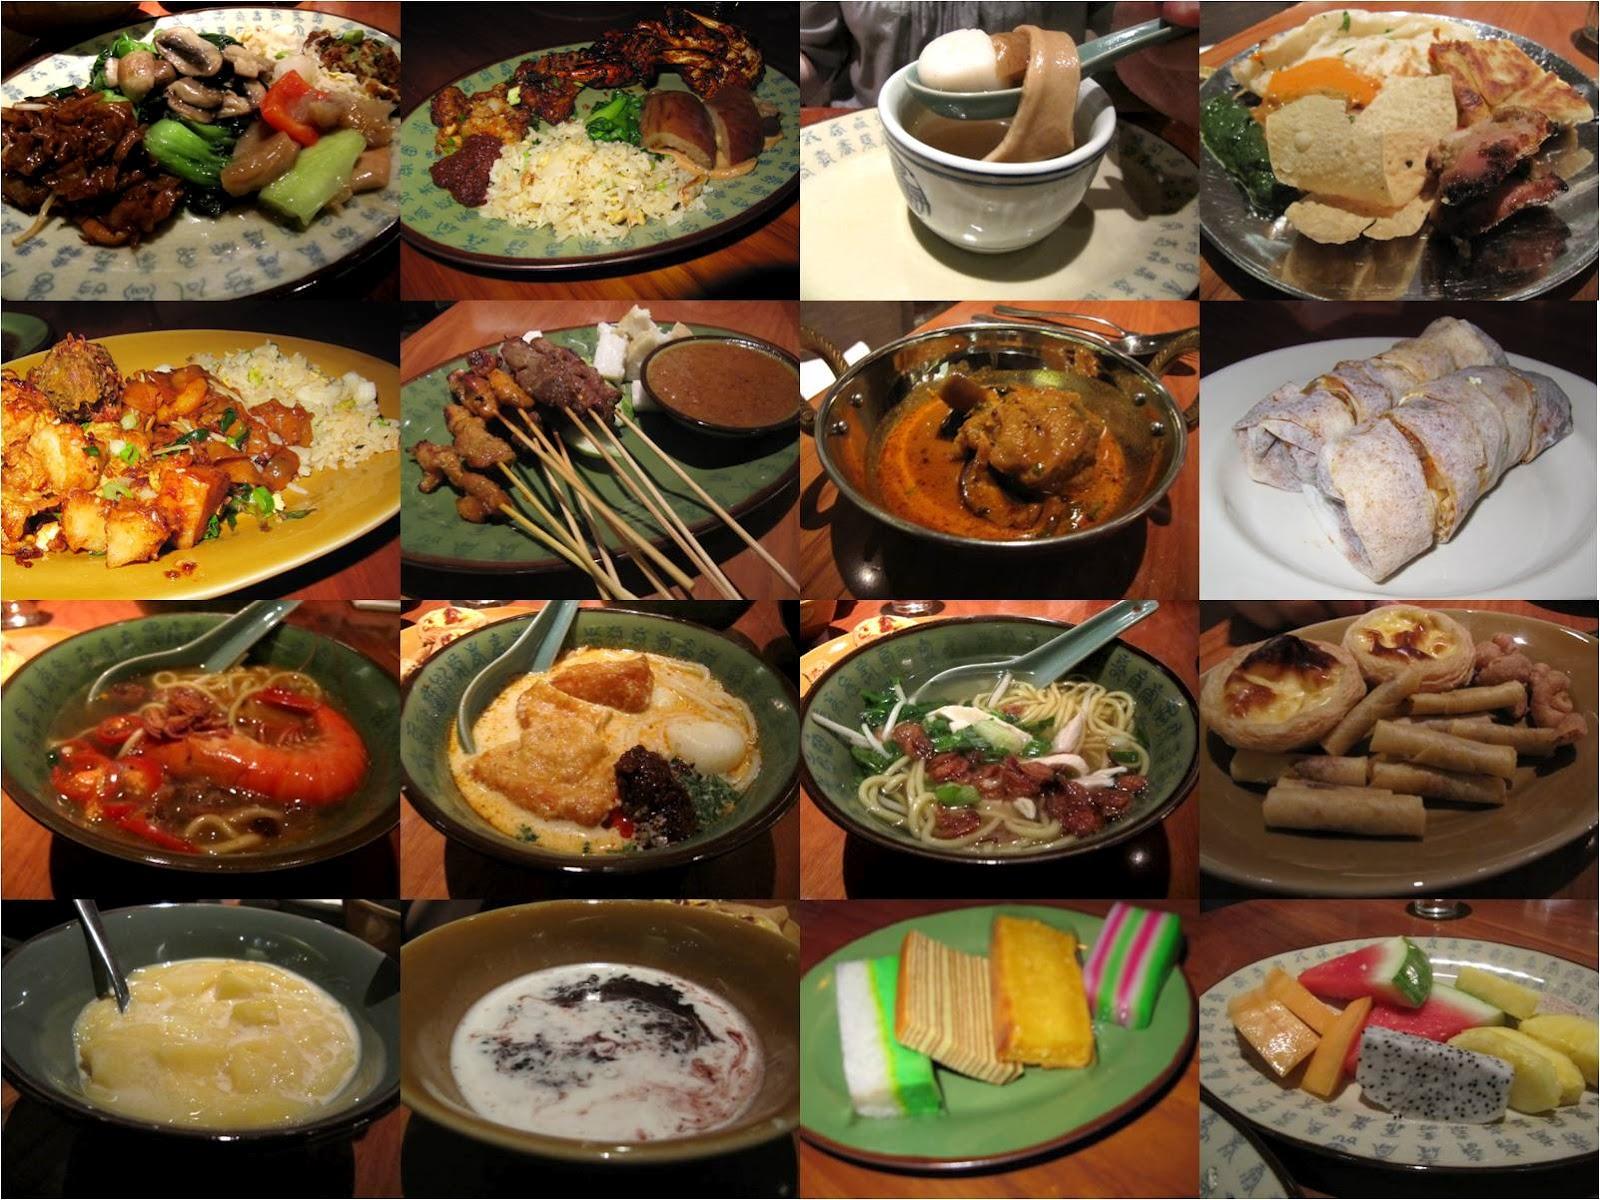 Wen's Delight: Straits Kitchen @ Grand Hyatt Hotel